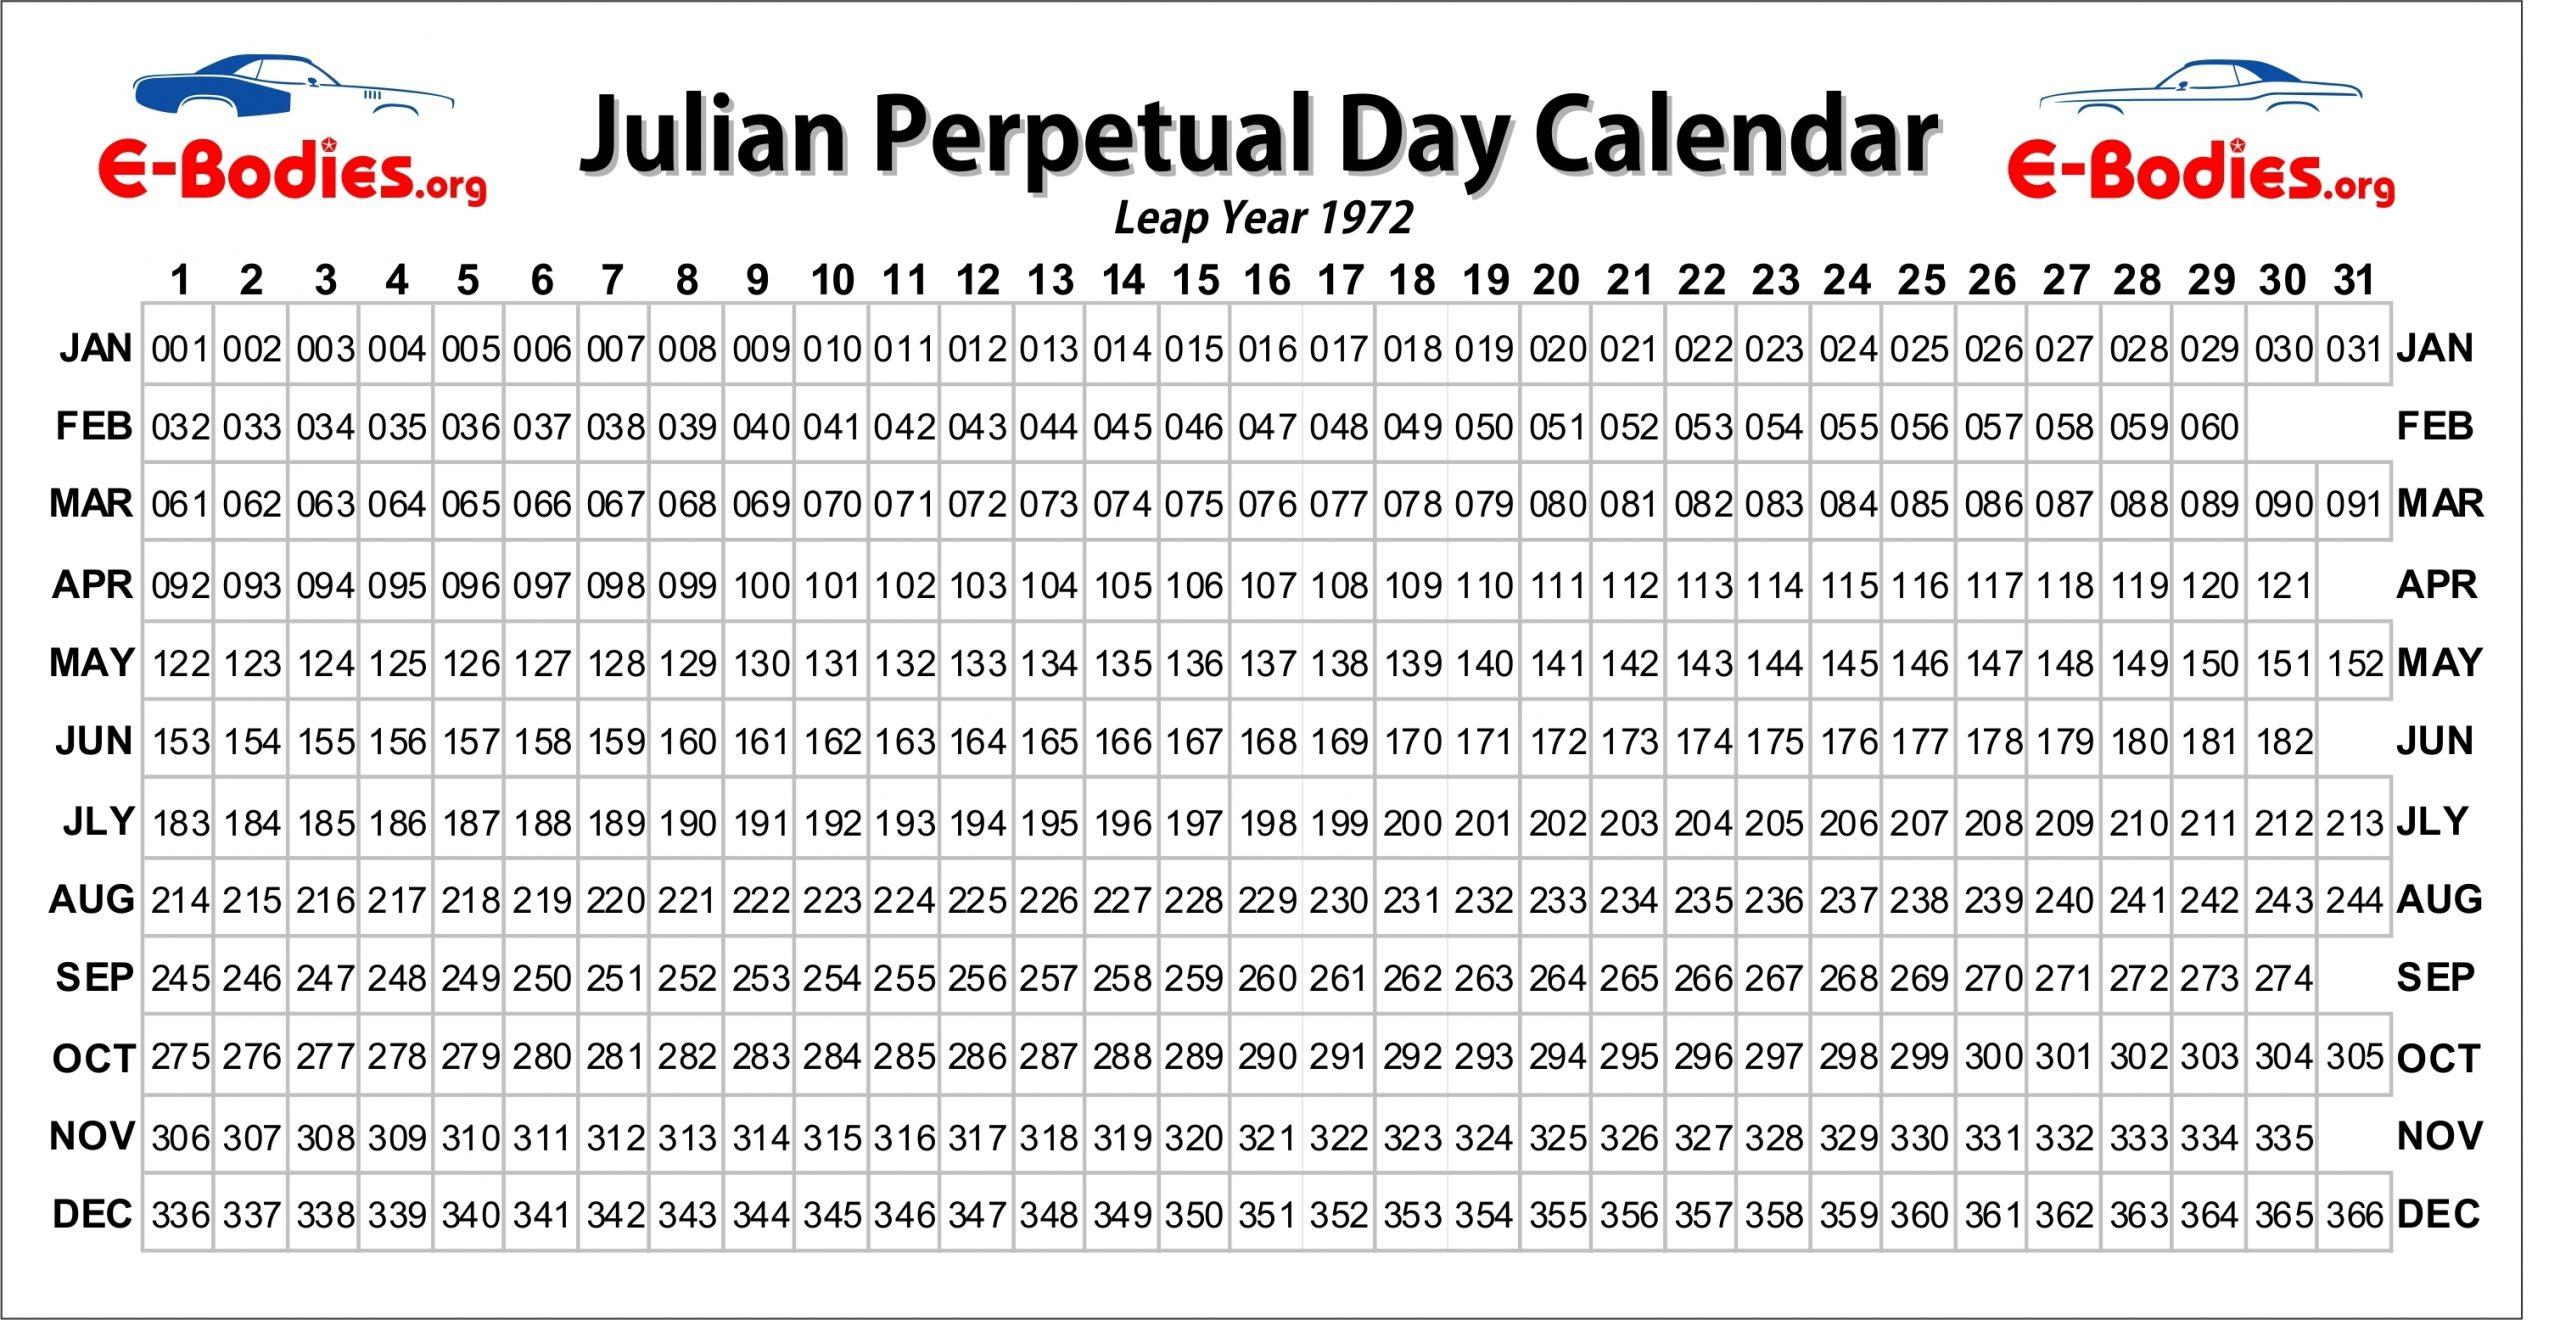 Mopar Julian Perpetual Day Calendar Leap Year – E-Bodies pertaining to Leap Year Julian Date Calendar